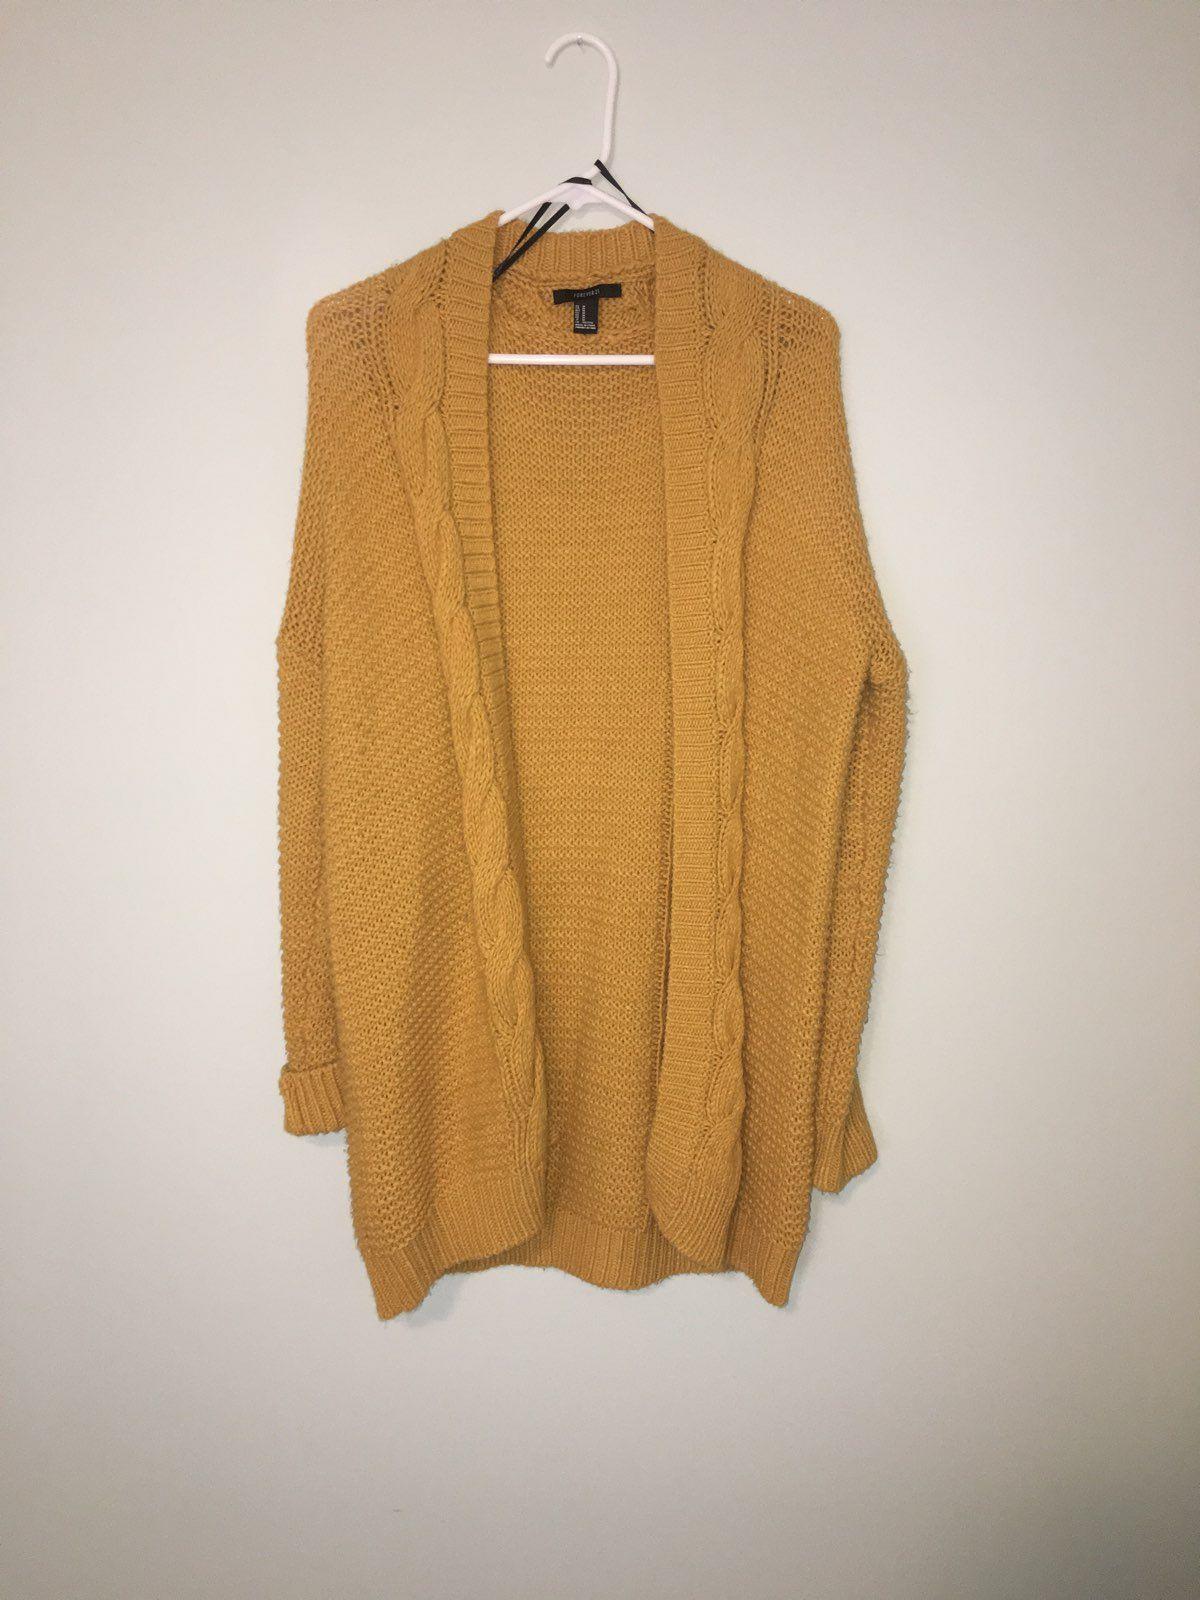 Mustard Yellow Cardigan - Mercari: BUY & SELL THINGS YOU LOVE